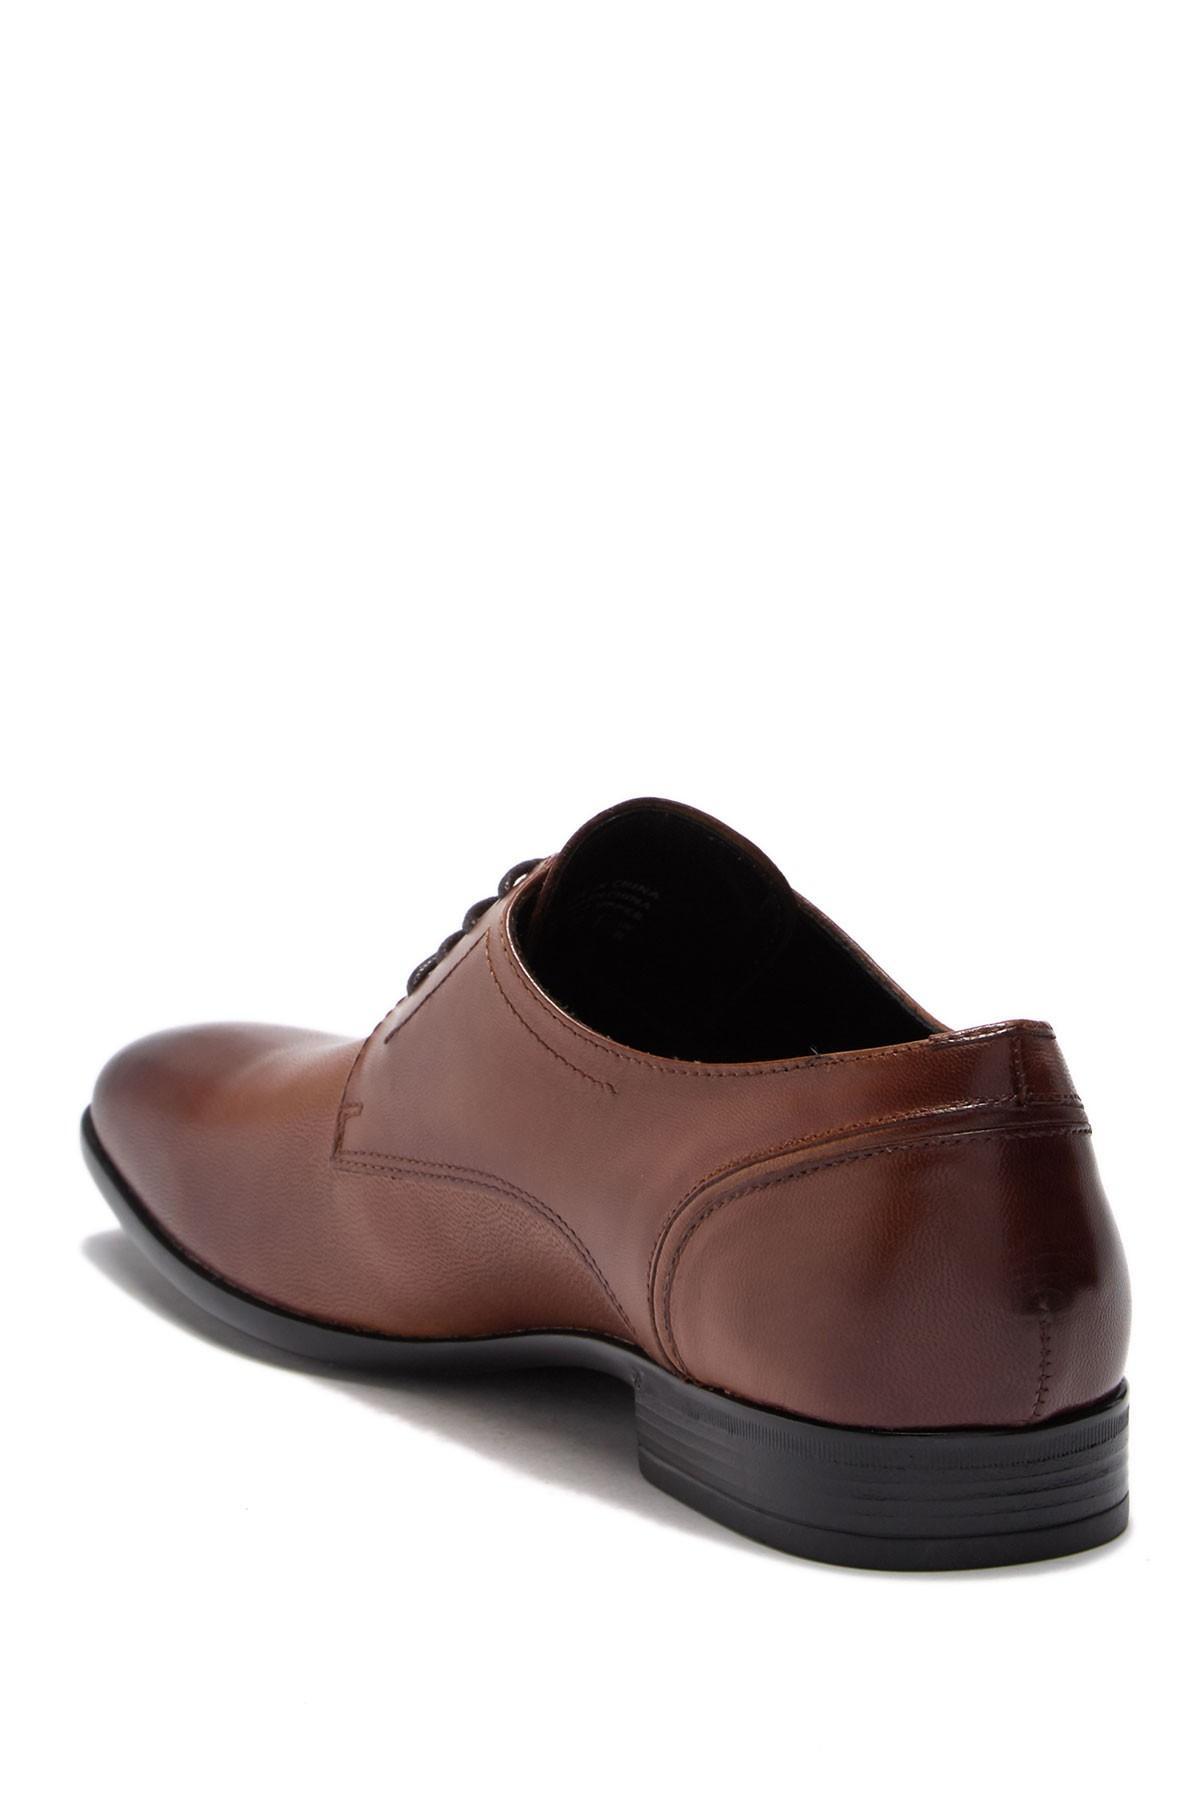 e9bfc4134427 ALDO - Brown Sevirari Leather Burnished Derby for Men - Lyst. View  fullscreen